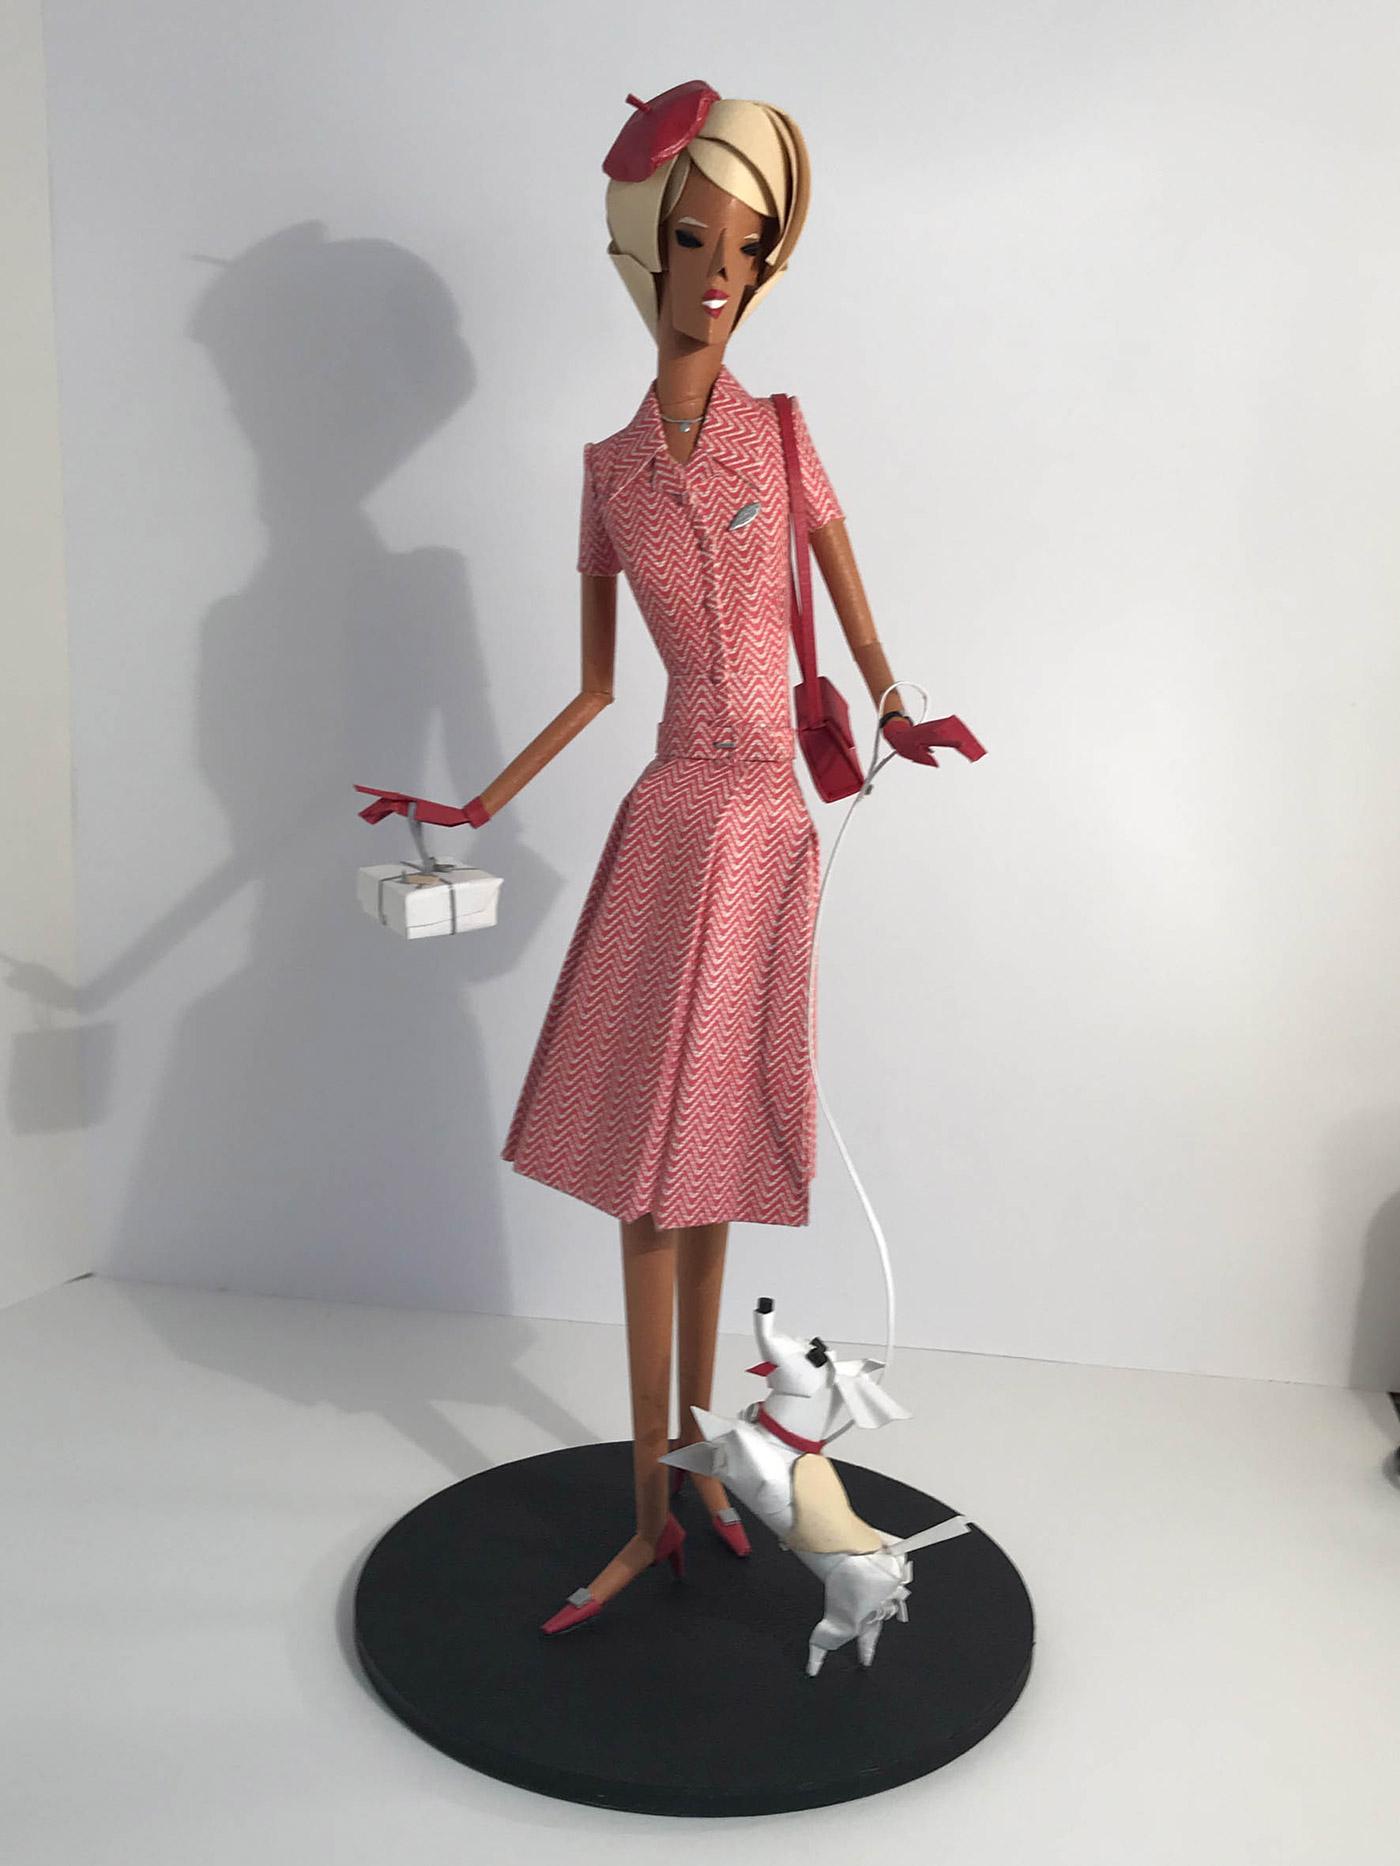 Fred-3-Dame-a-la-robe-rouge-a-galerie-bettina-art-contemporain-paris